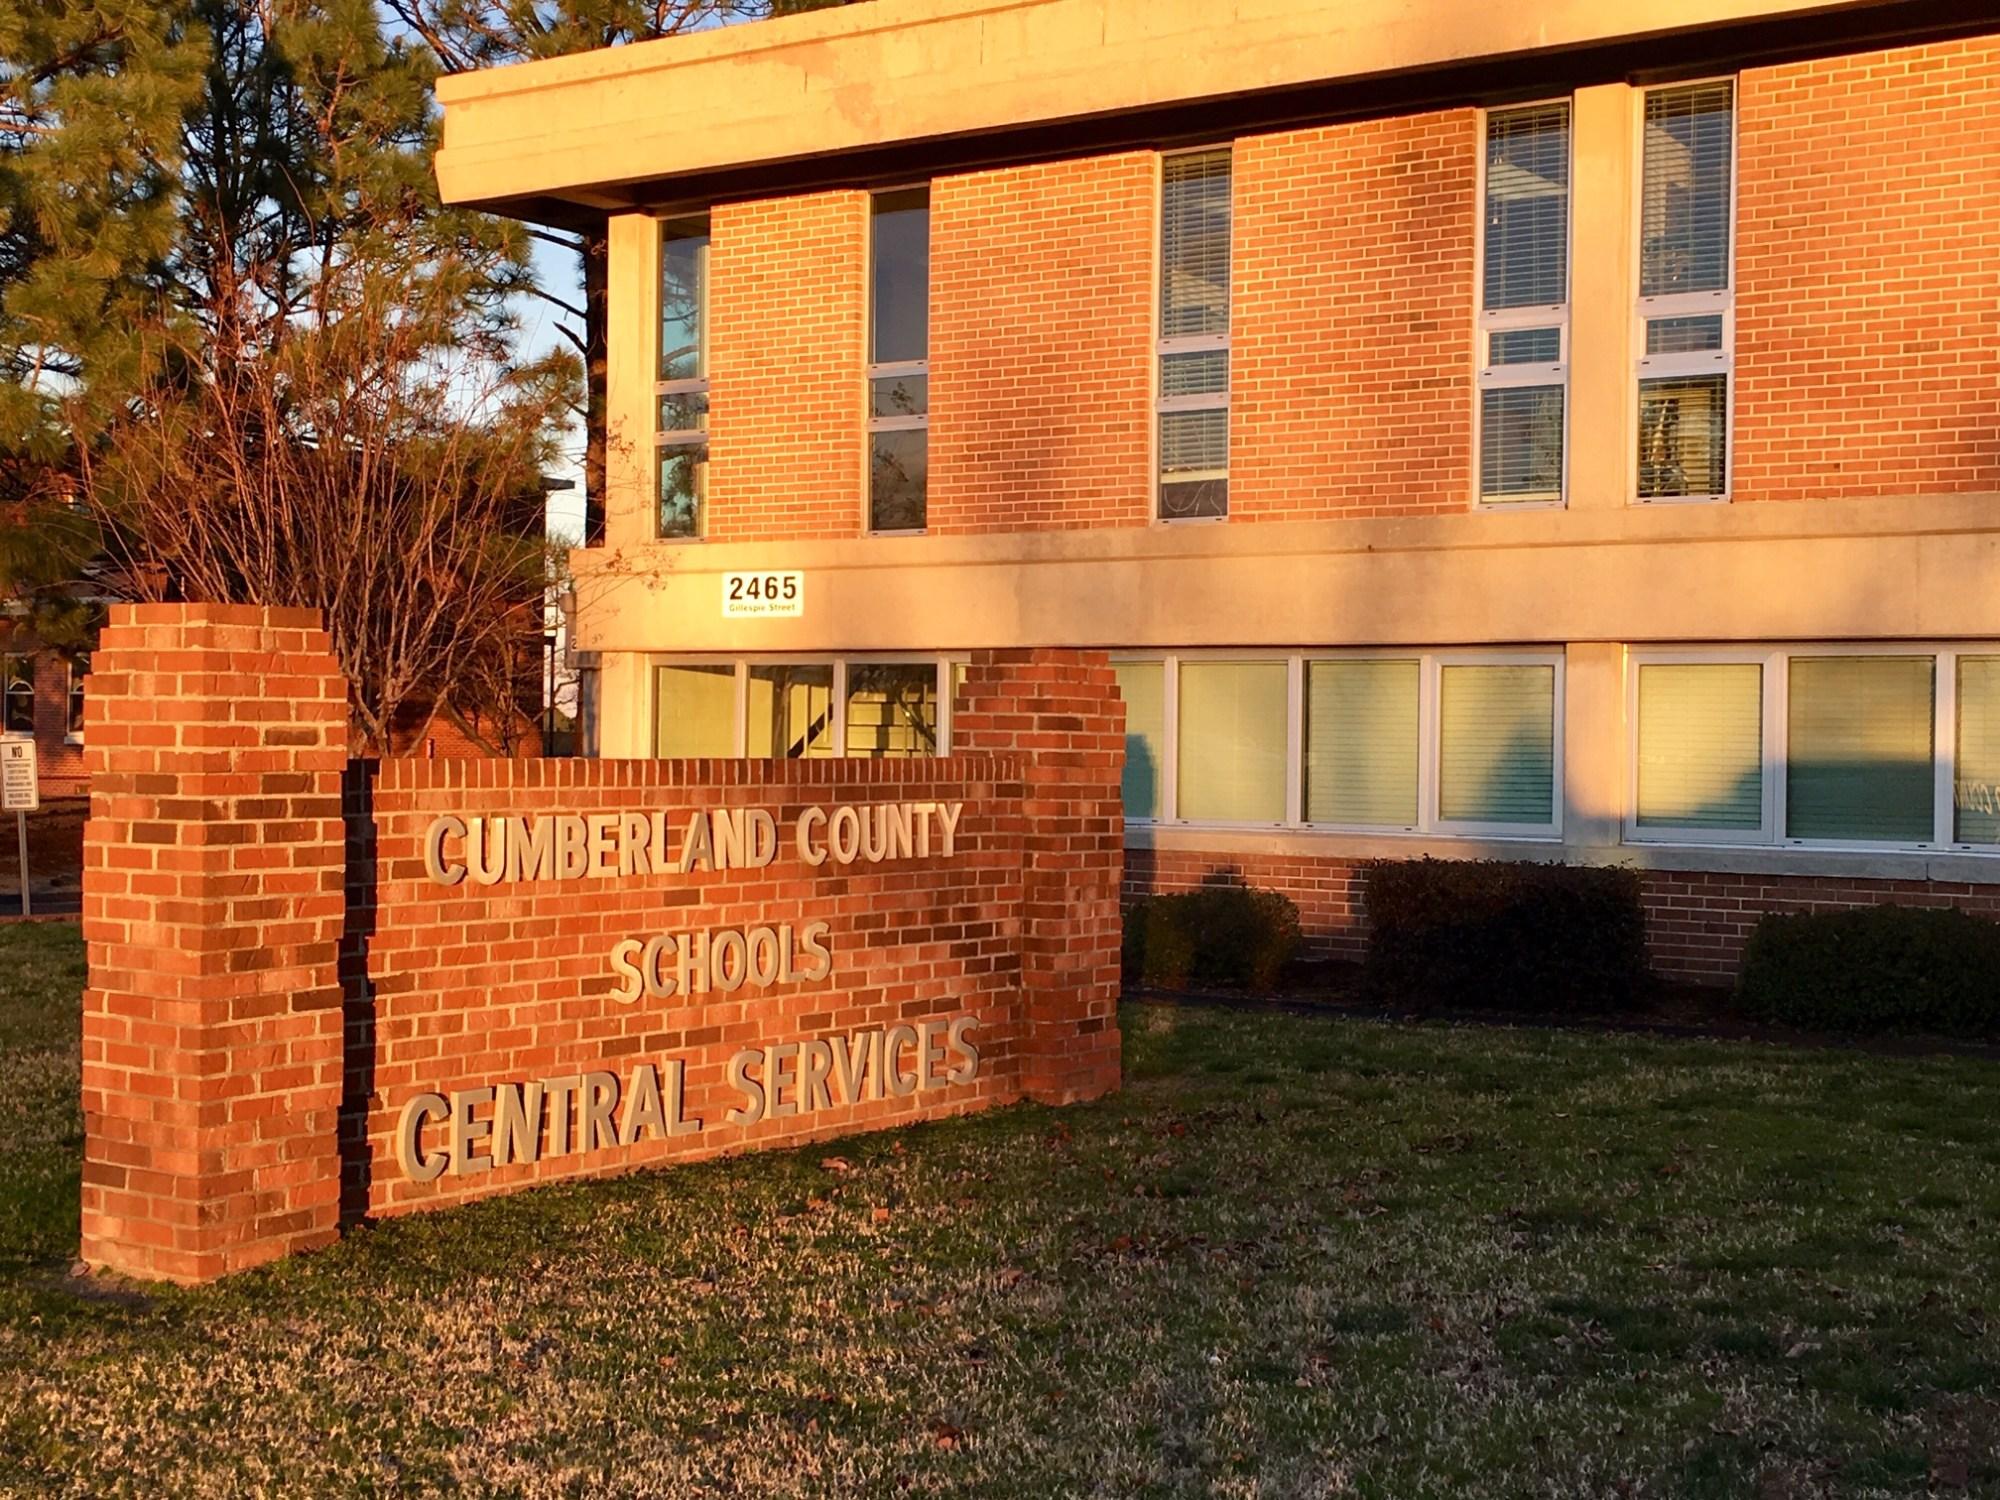 Cumberland County Schools generic